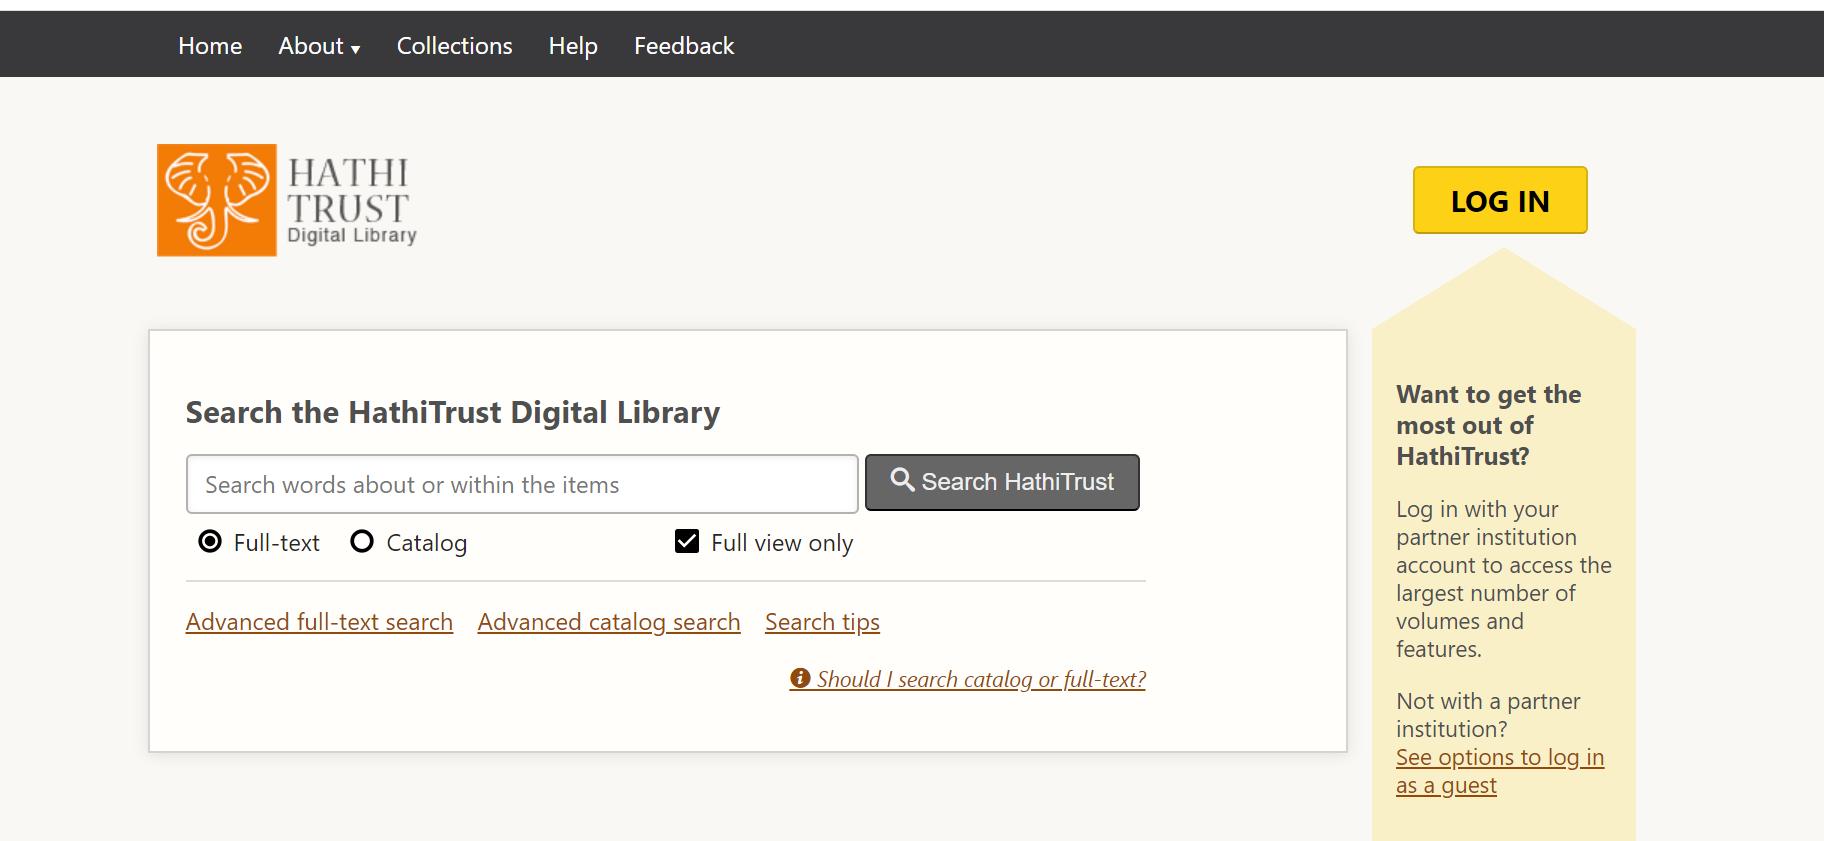 screenshot of Hathi Homepage showing the LOGIN button